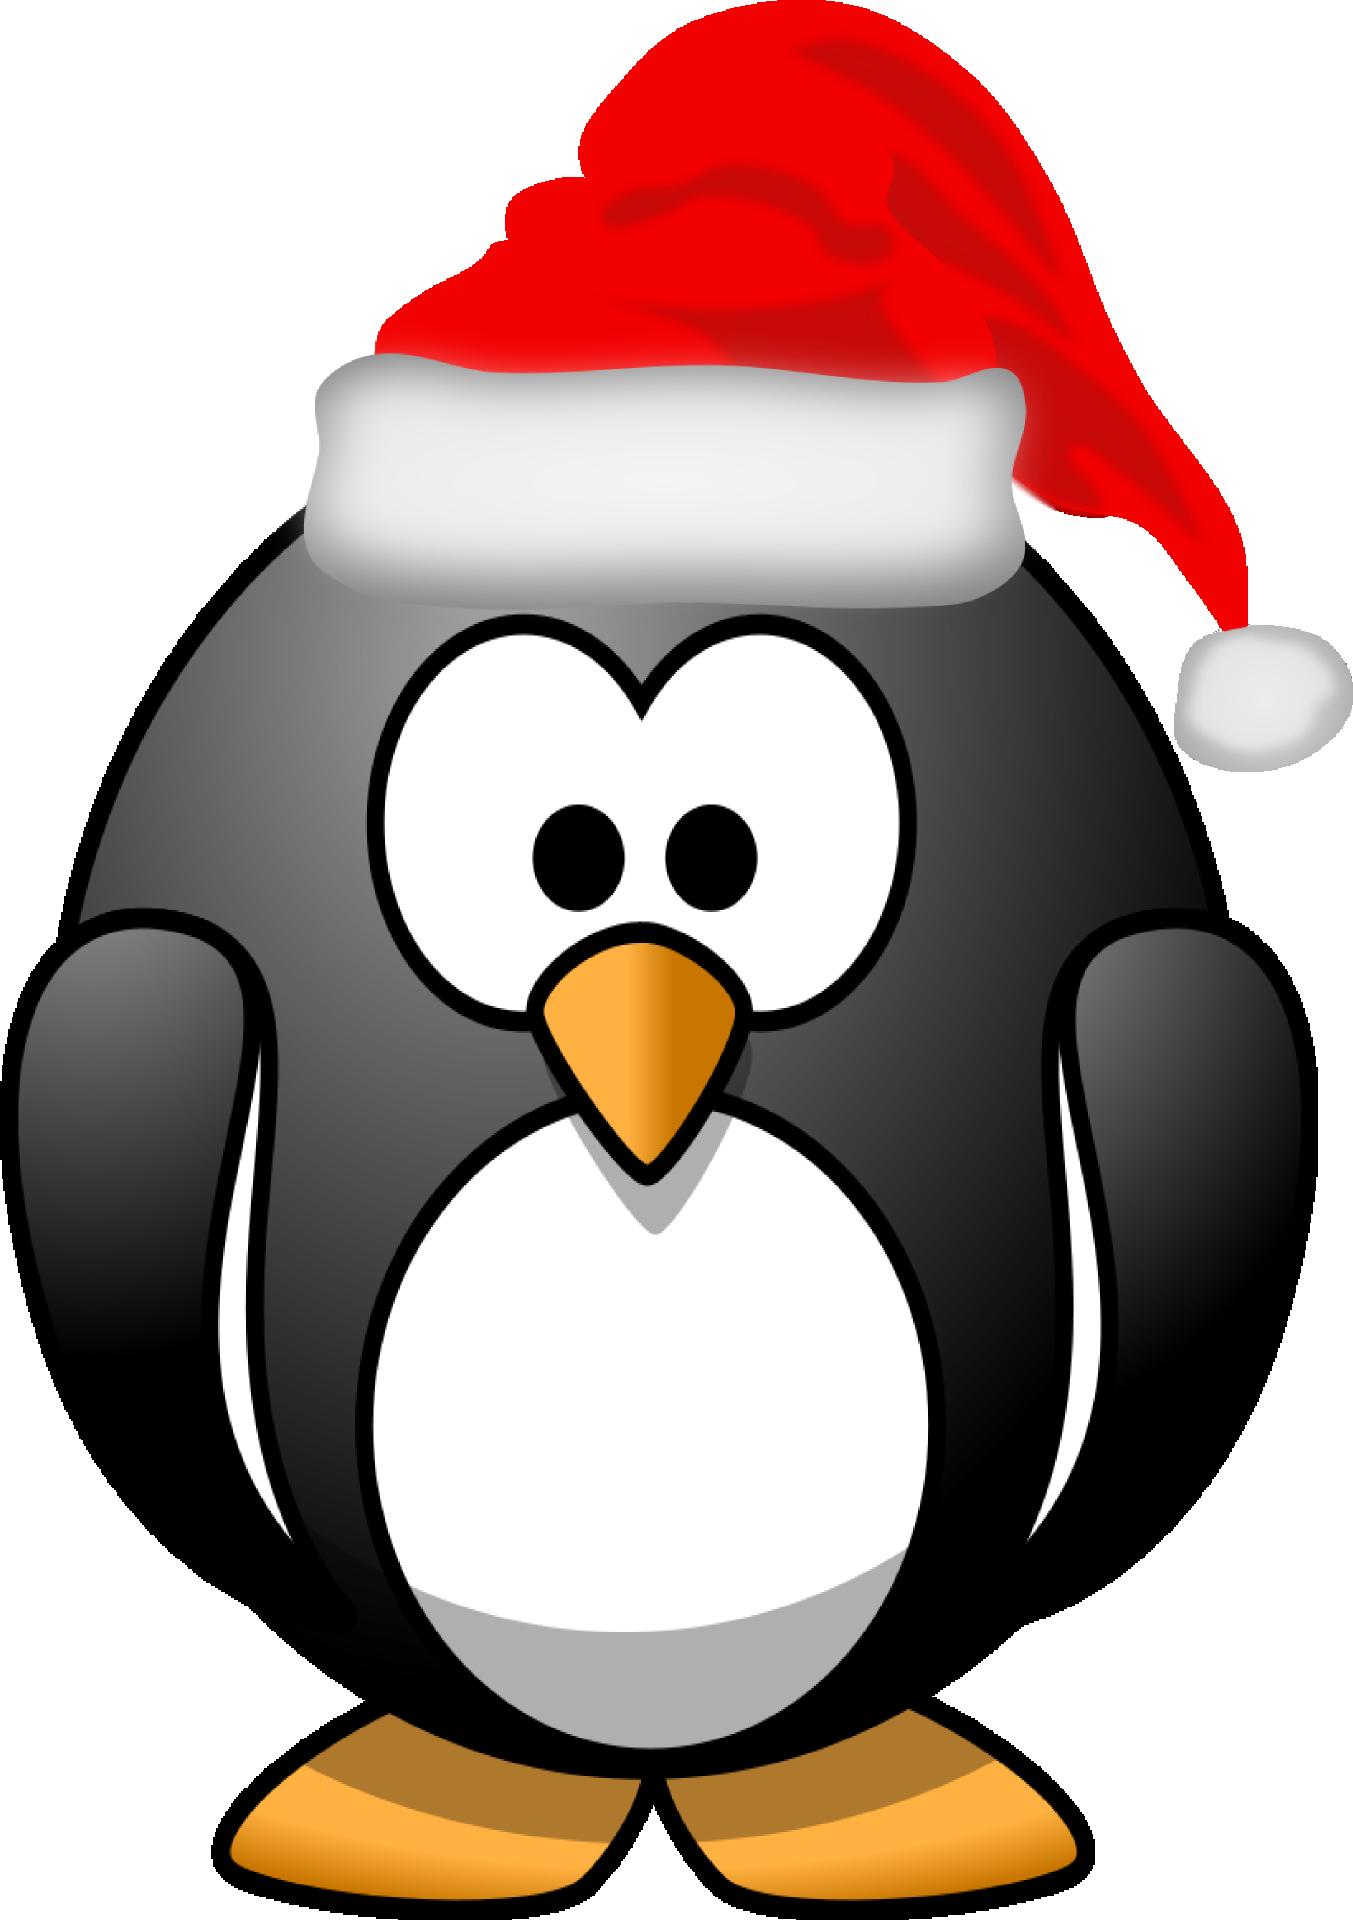 Clipart penguin hat. Xmas santa claus tux